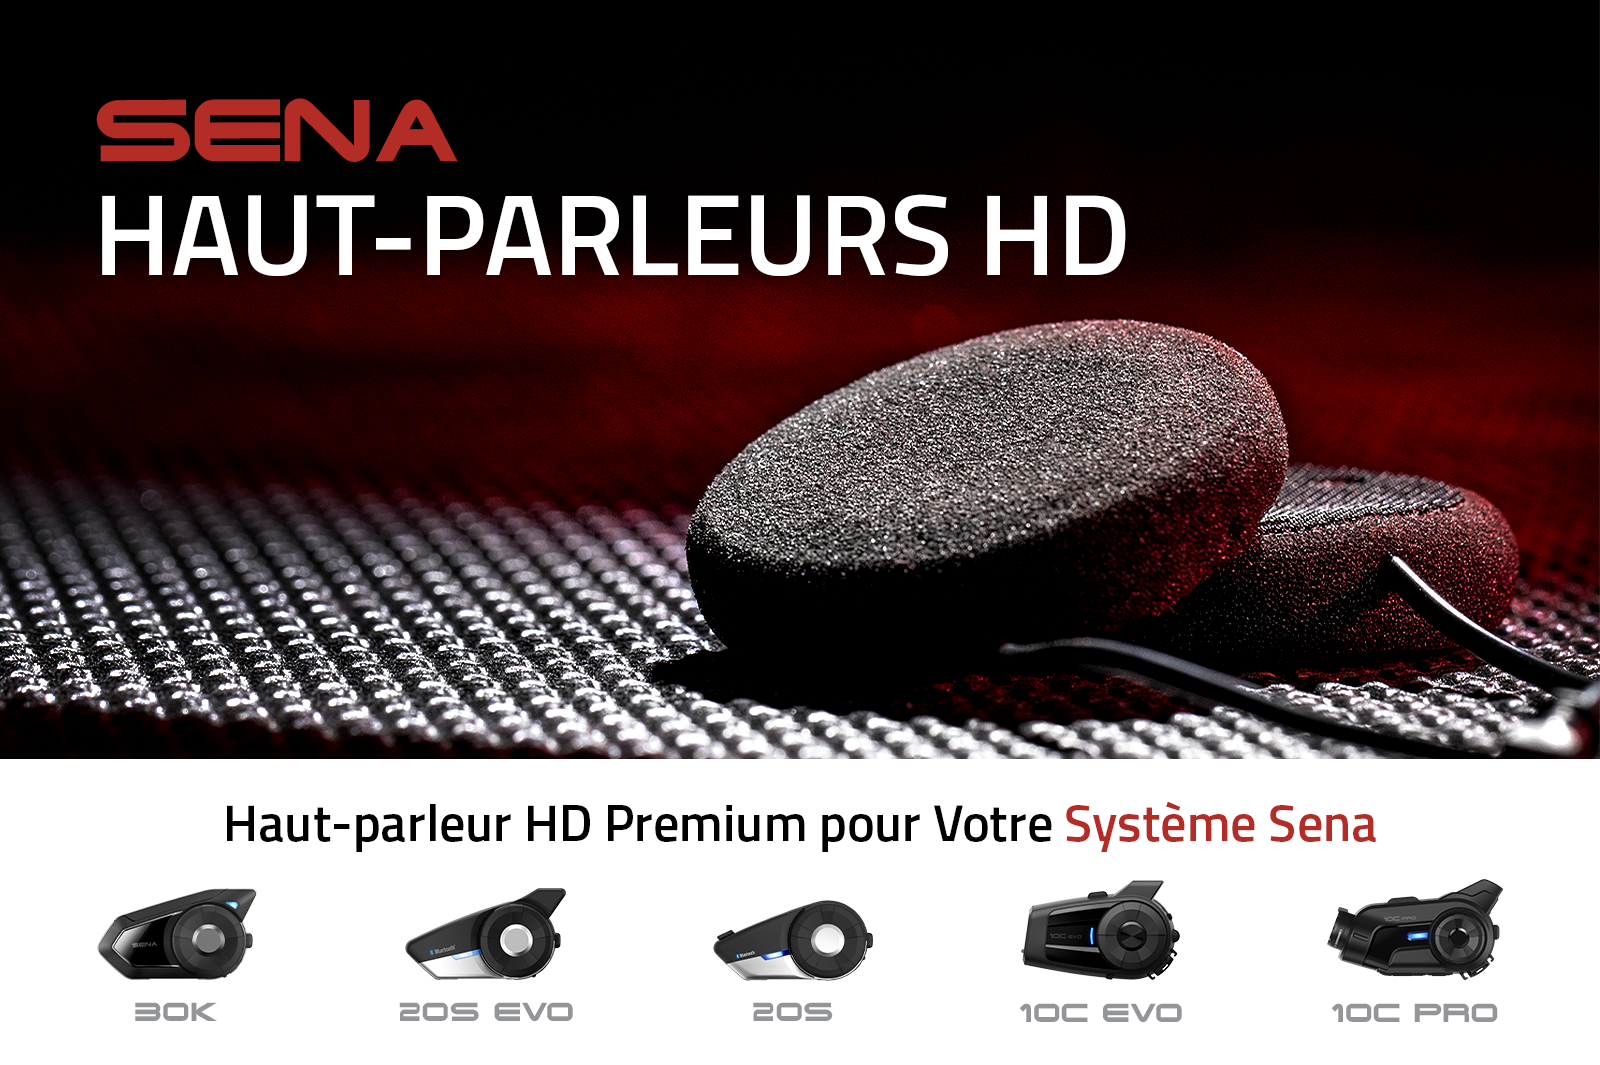 Sena-HD-Speakers-Announcement_Press-Release-EN